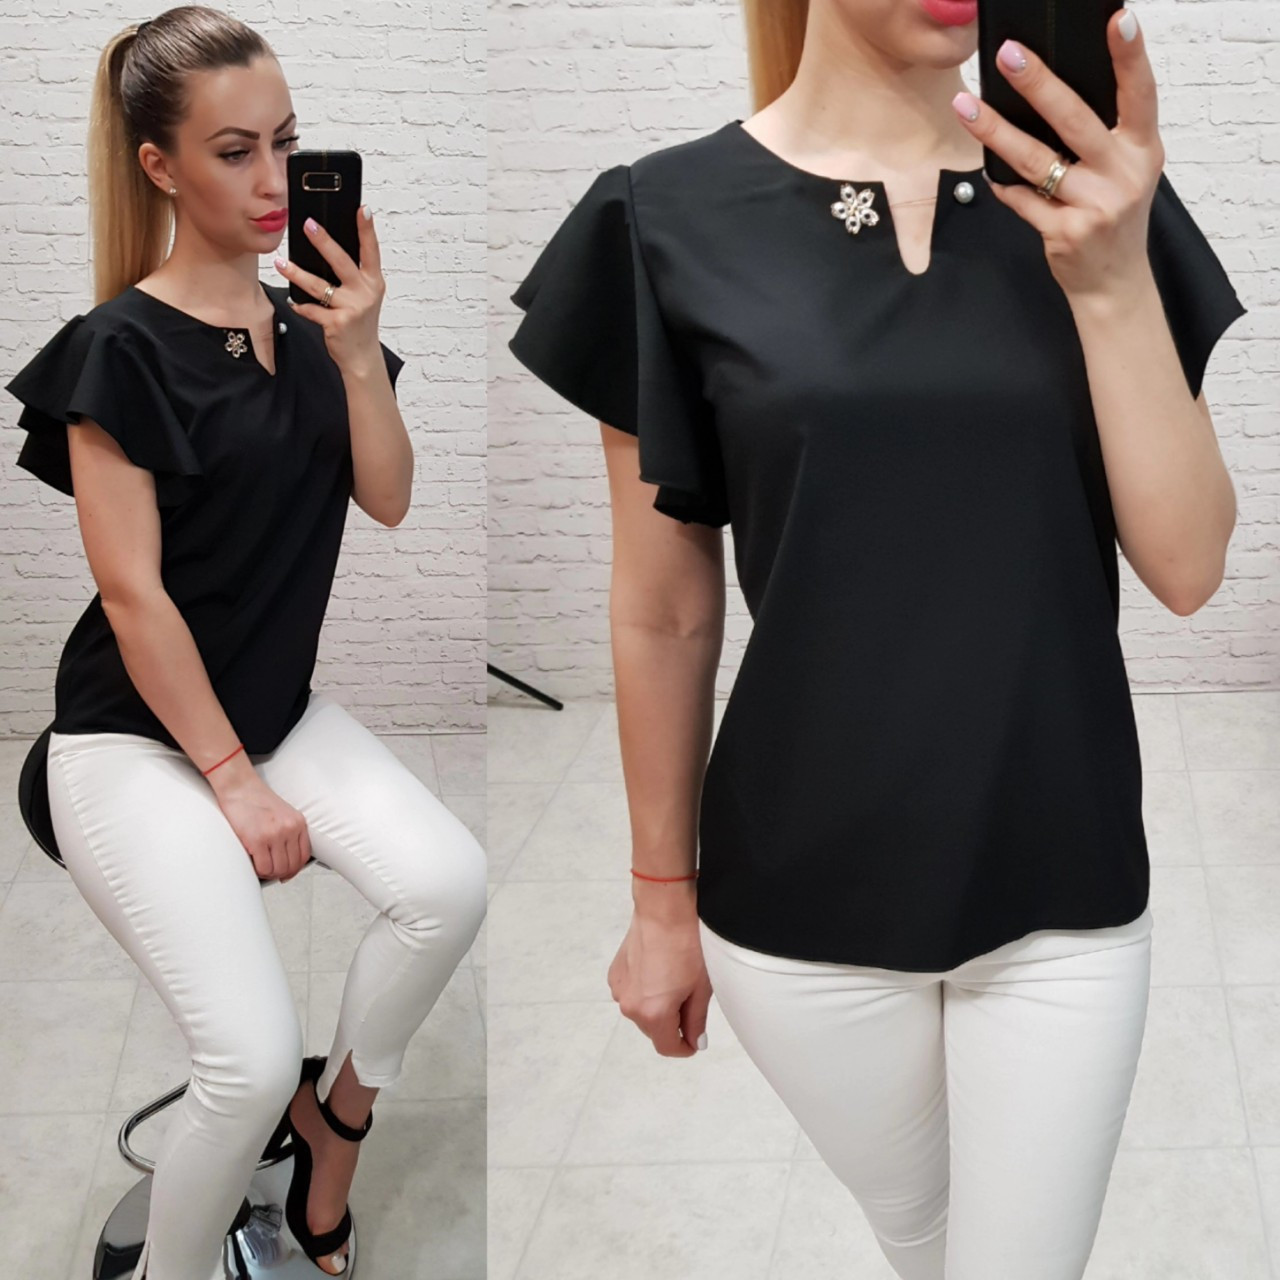 Блузка / блуза з брошкою без рукава арт. 166 чорний / чорний